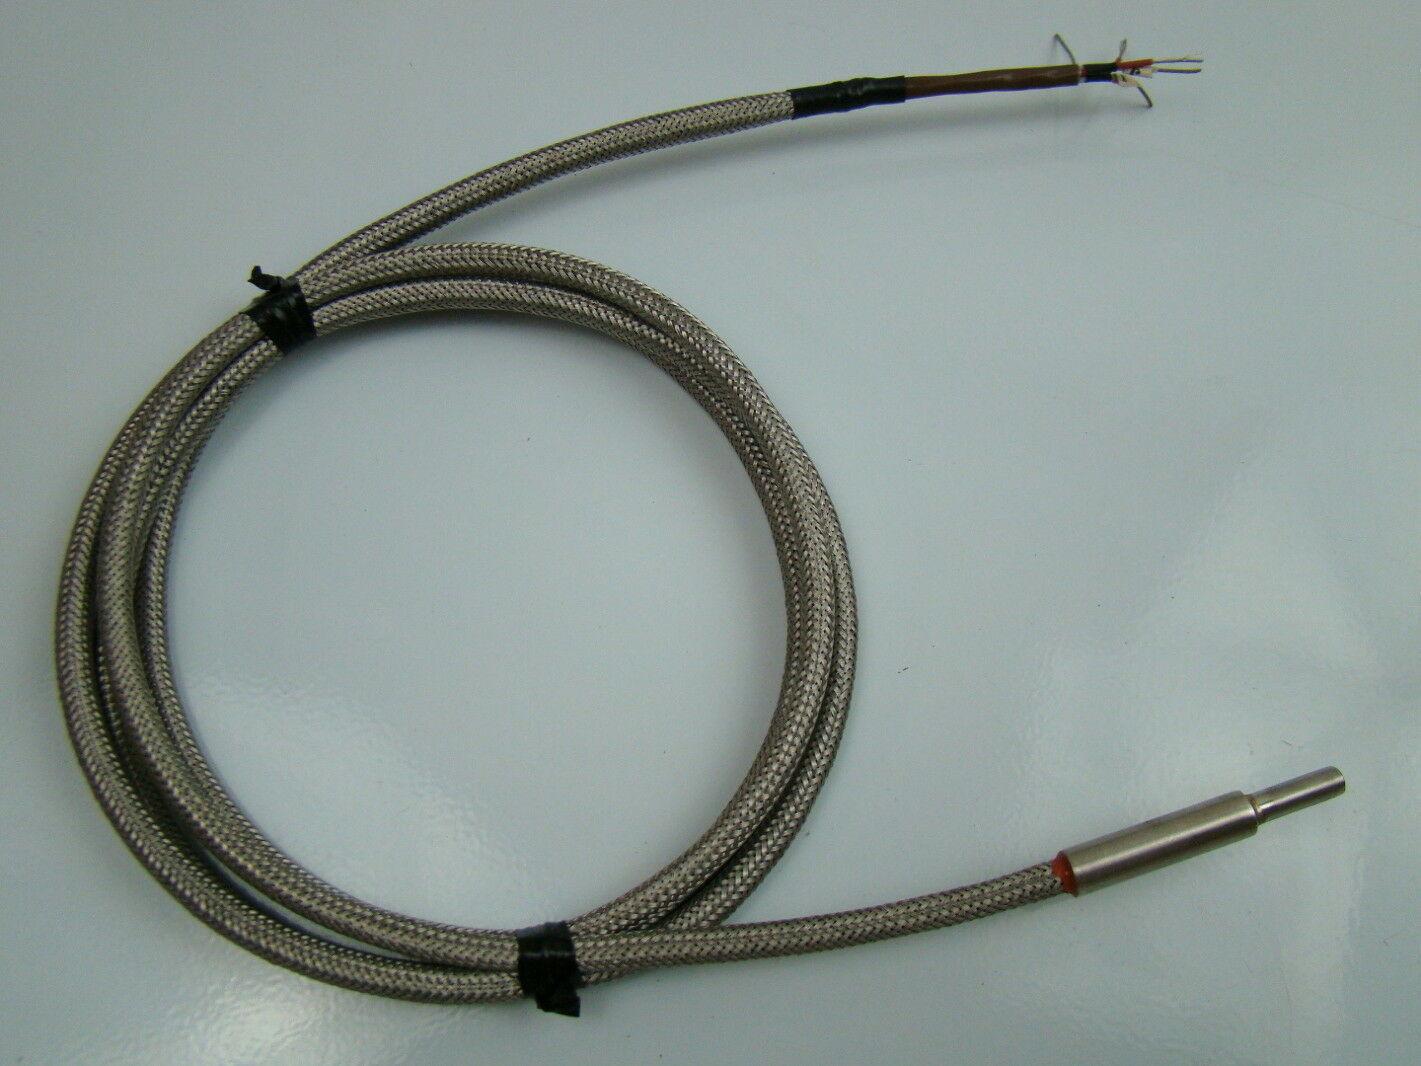 Pyco Thermocouple Braided Wire 21-6033-JJ-2.3-72   Joseph Fazzio ...